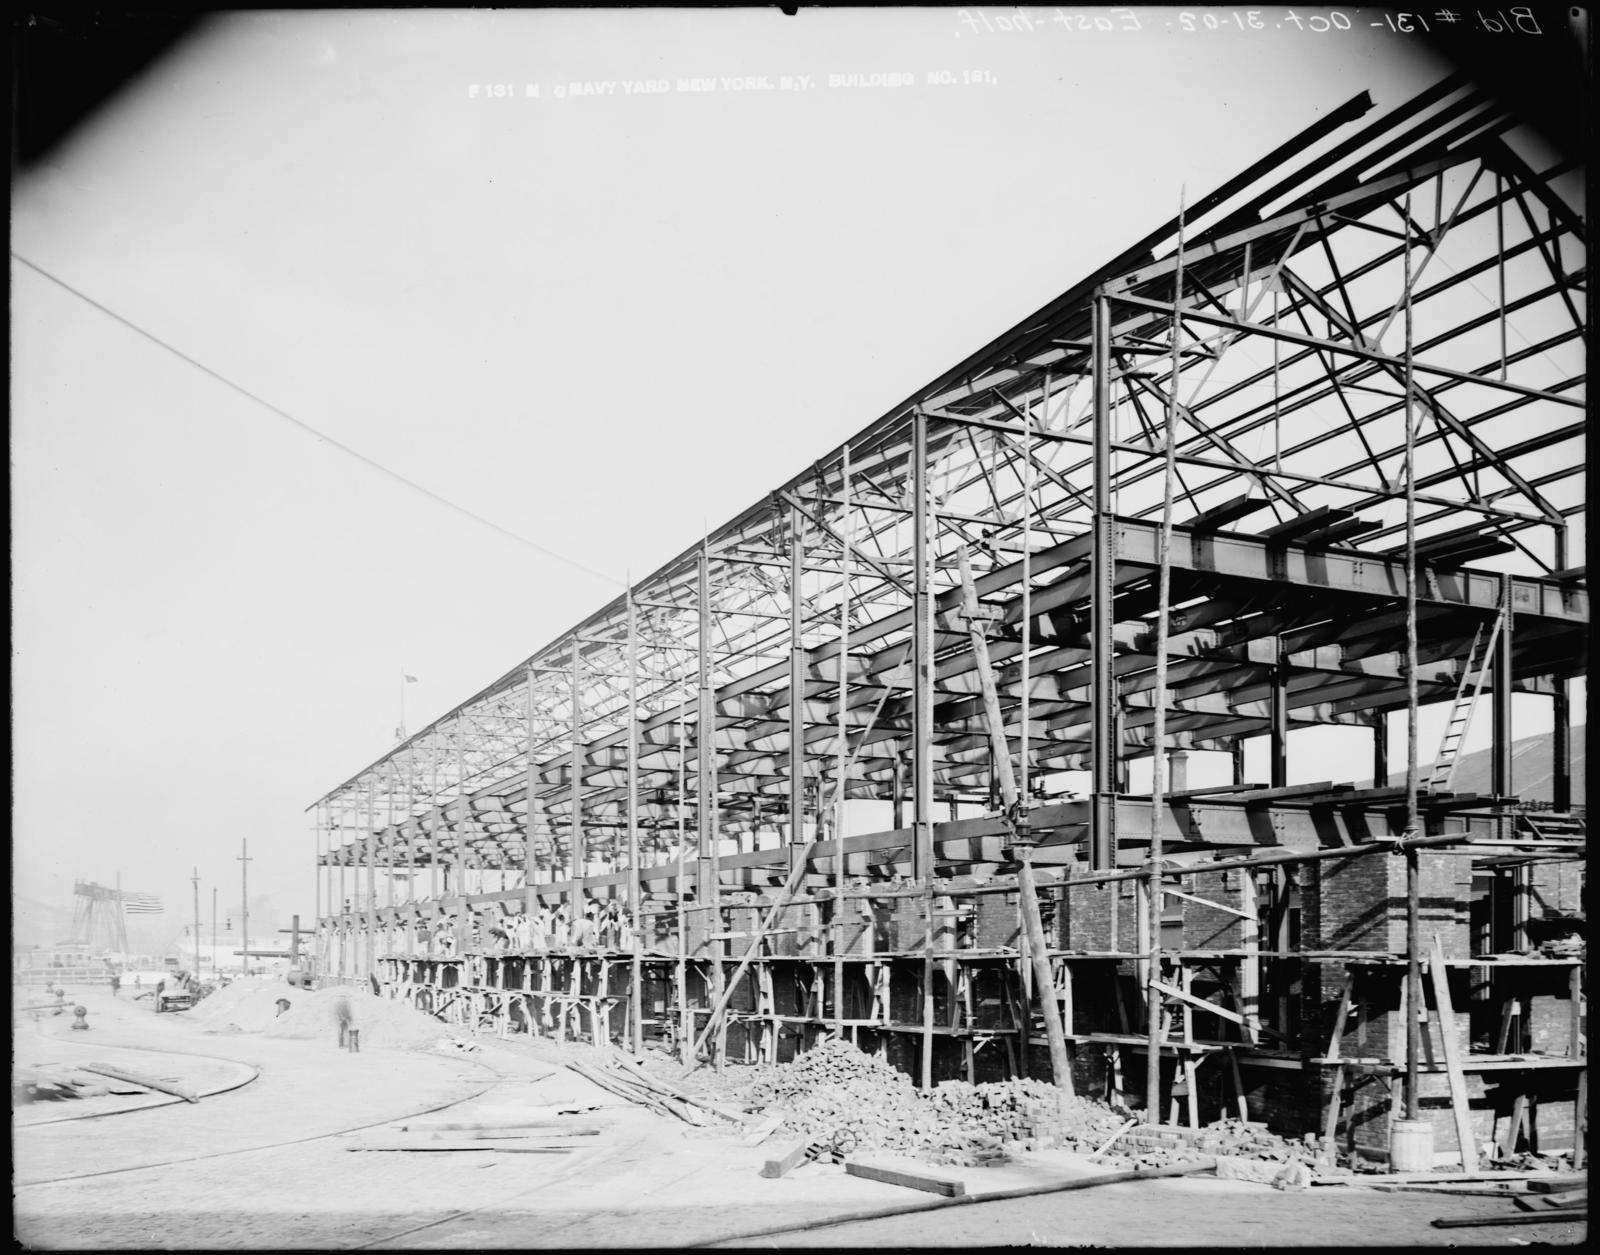 Building Number 131